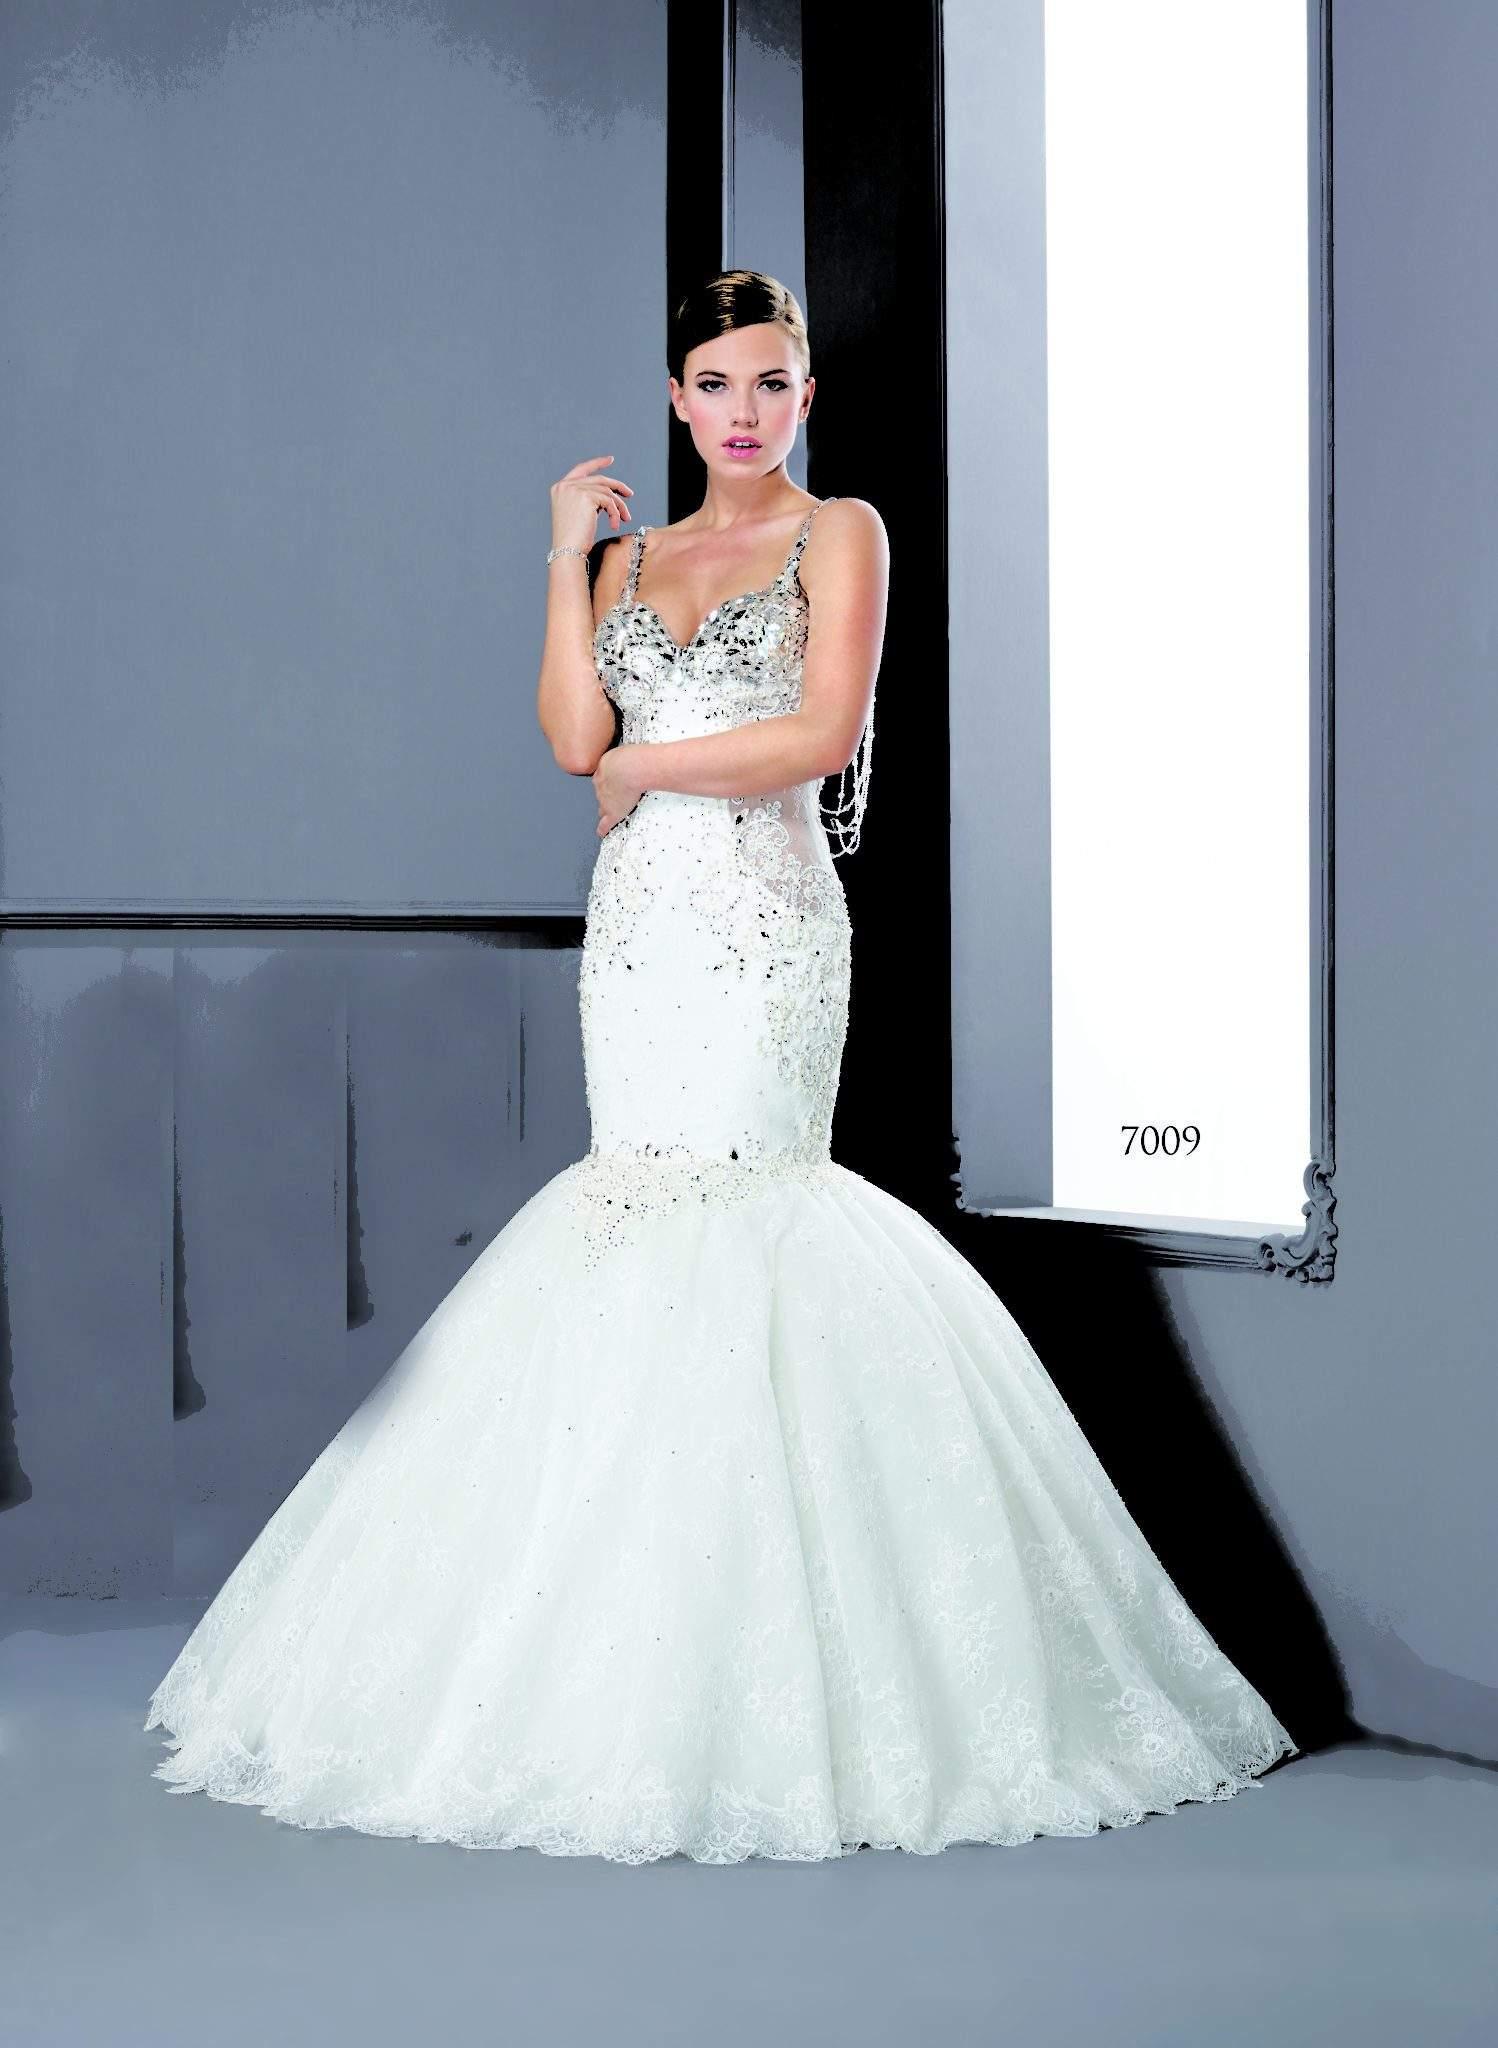 Silk bridal gowns with swarovski crystals darius cordell fashion ltd swarovski crystal wedding gowns junglespirit Choice Image